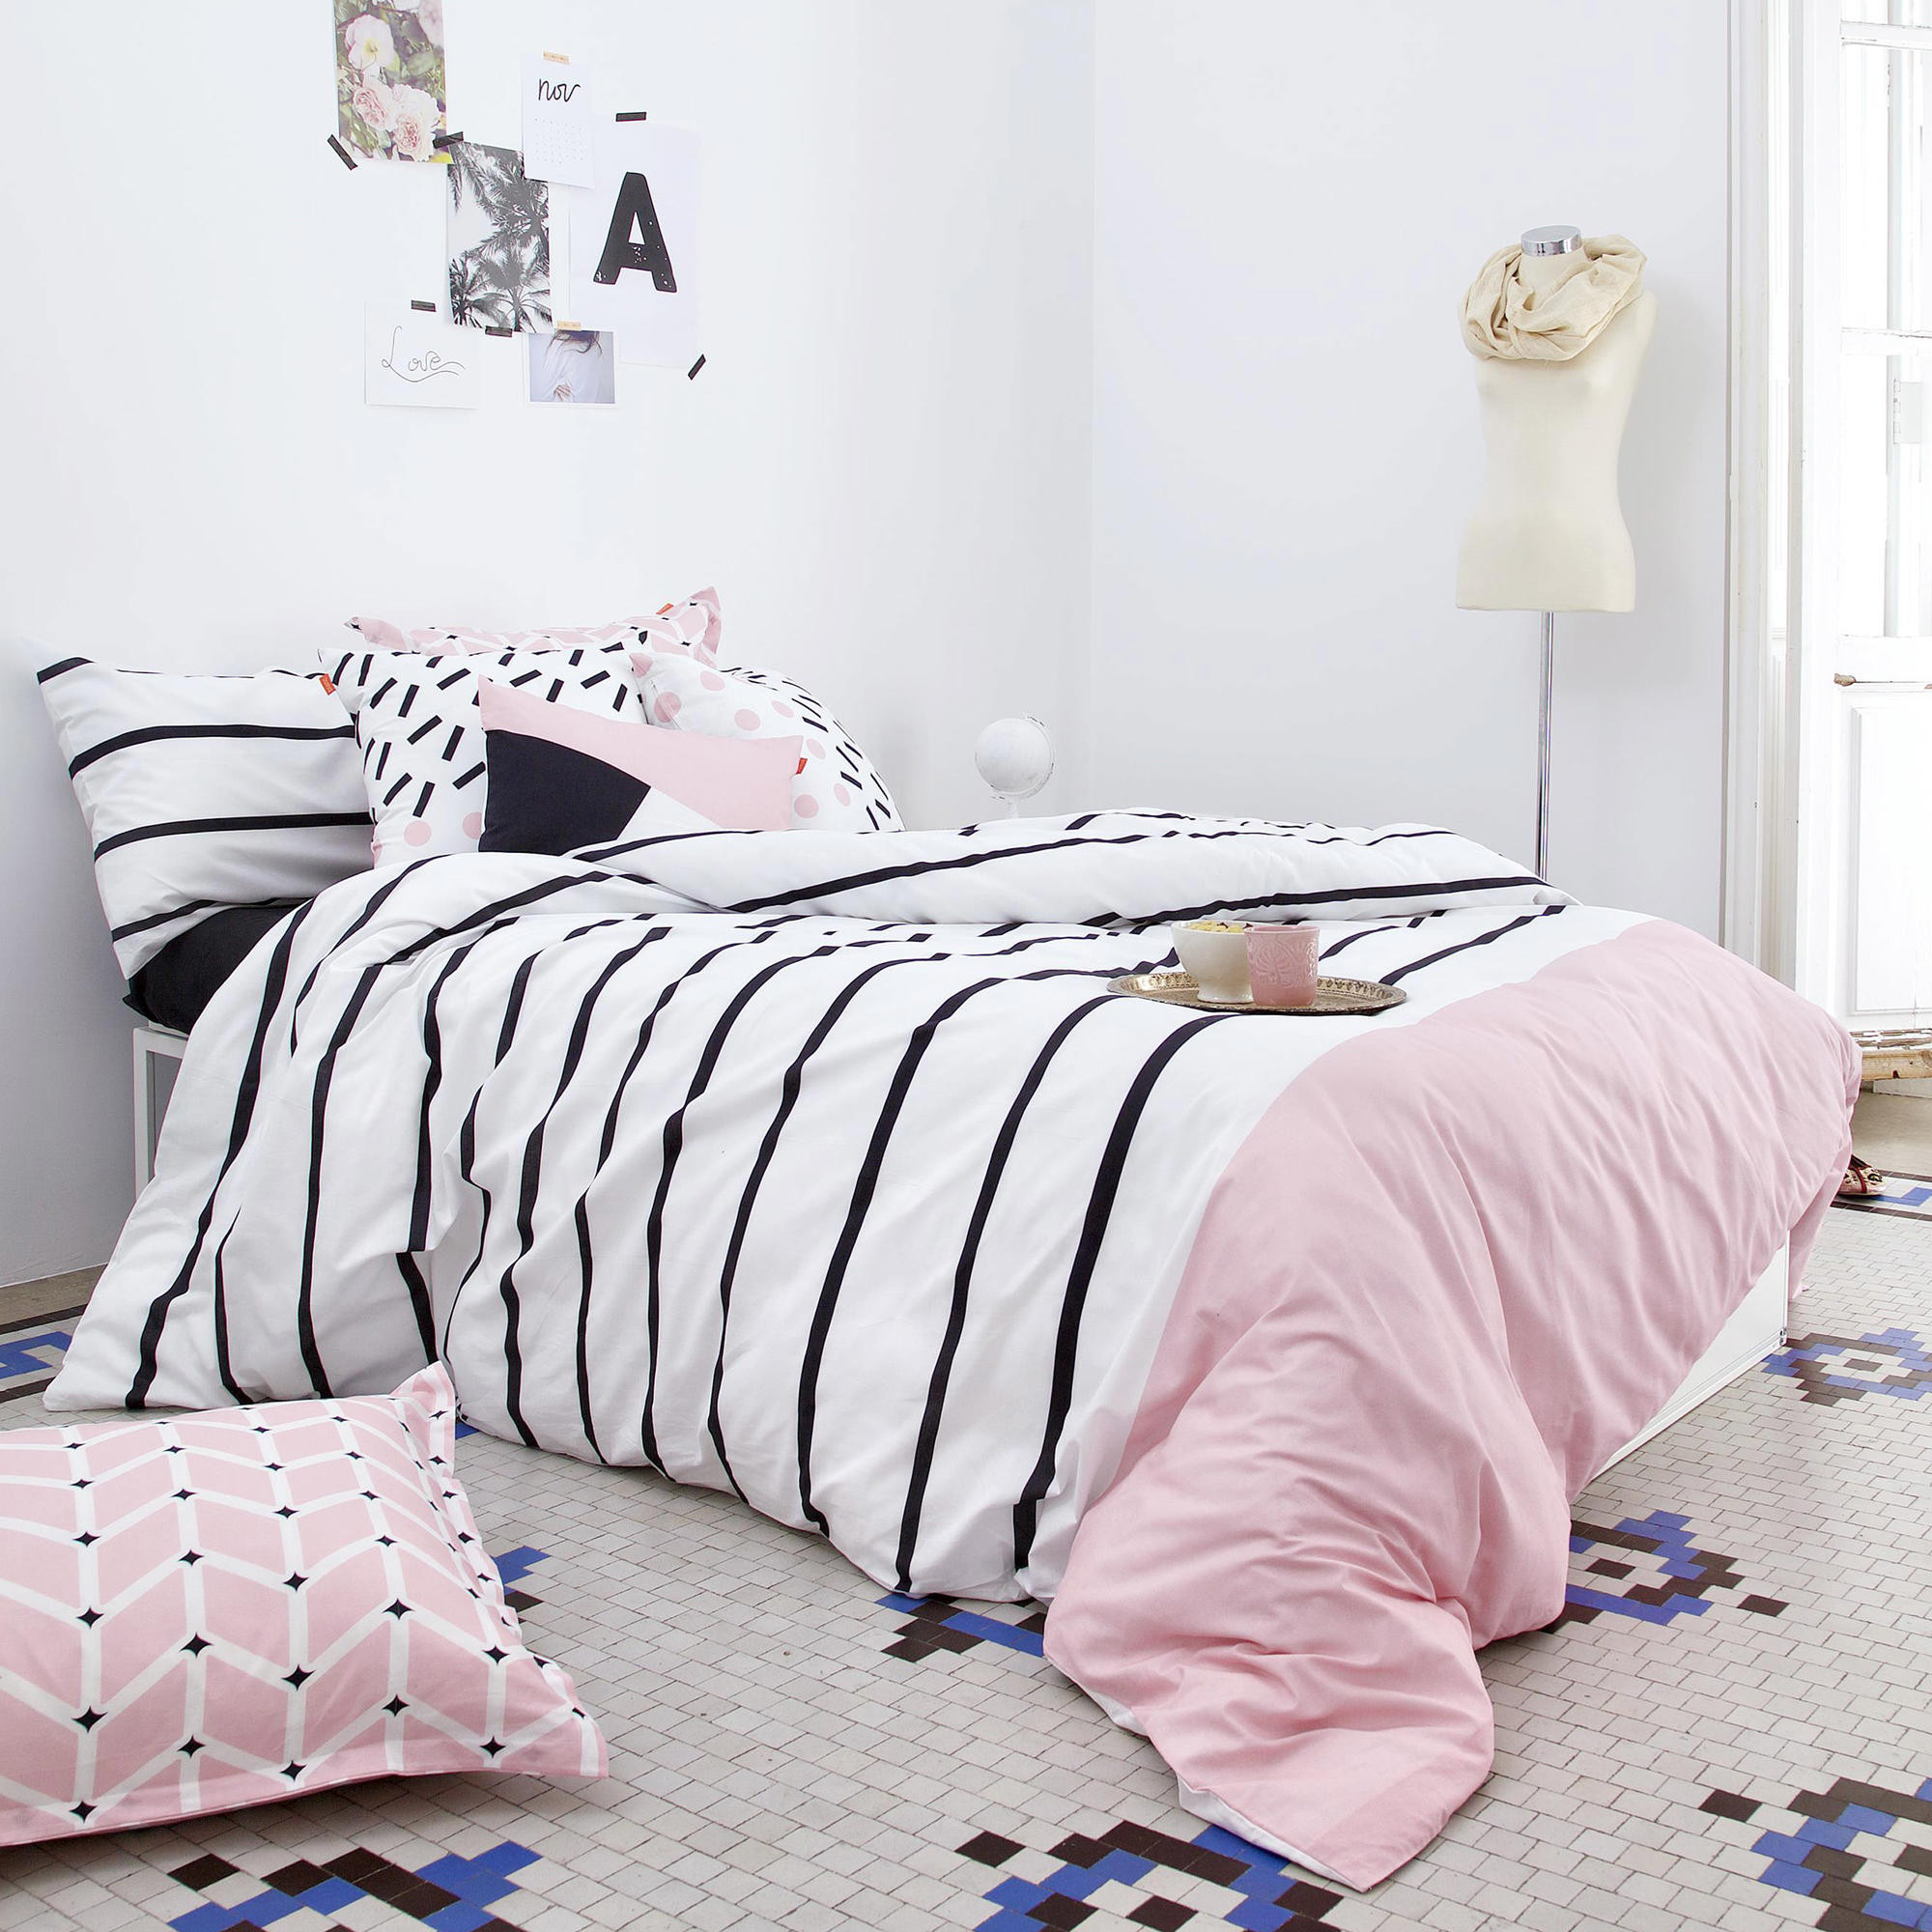 Bettbezug | Blush-140 x 200 cm